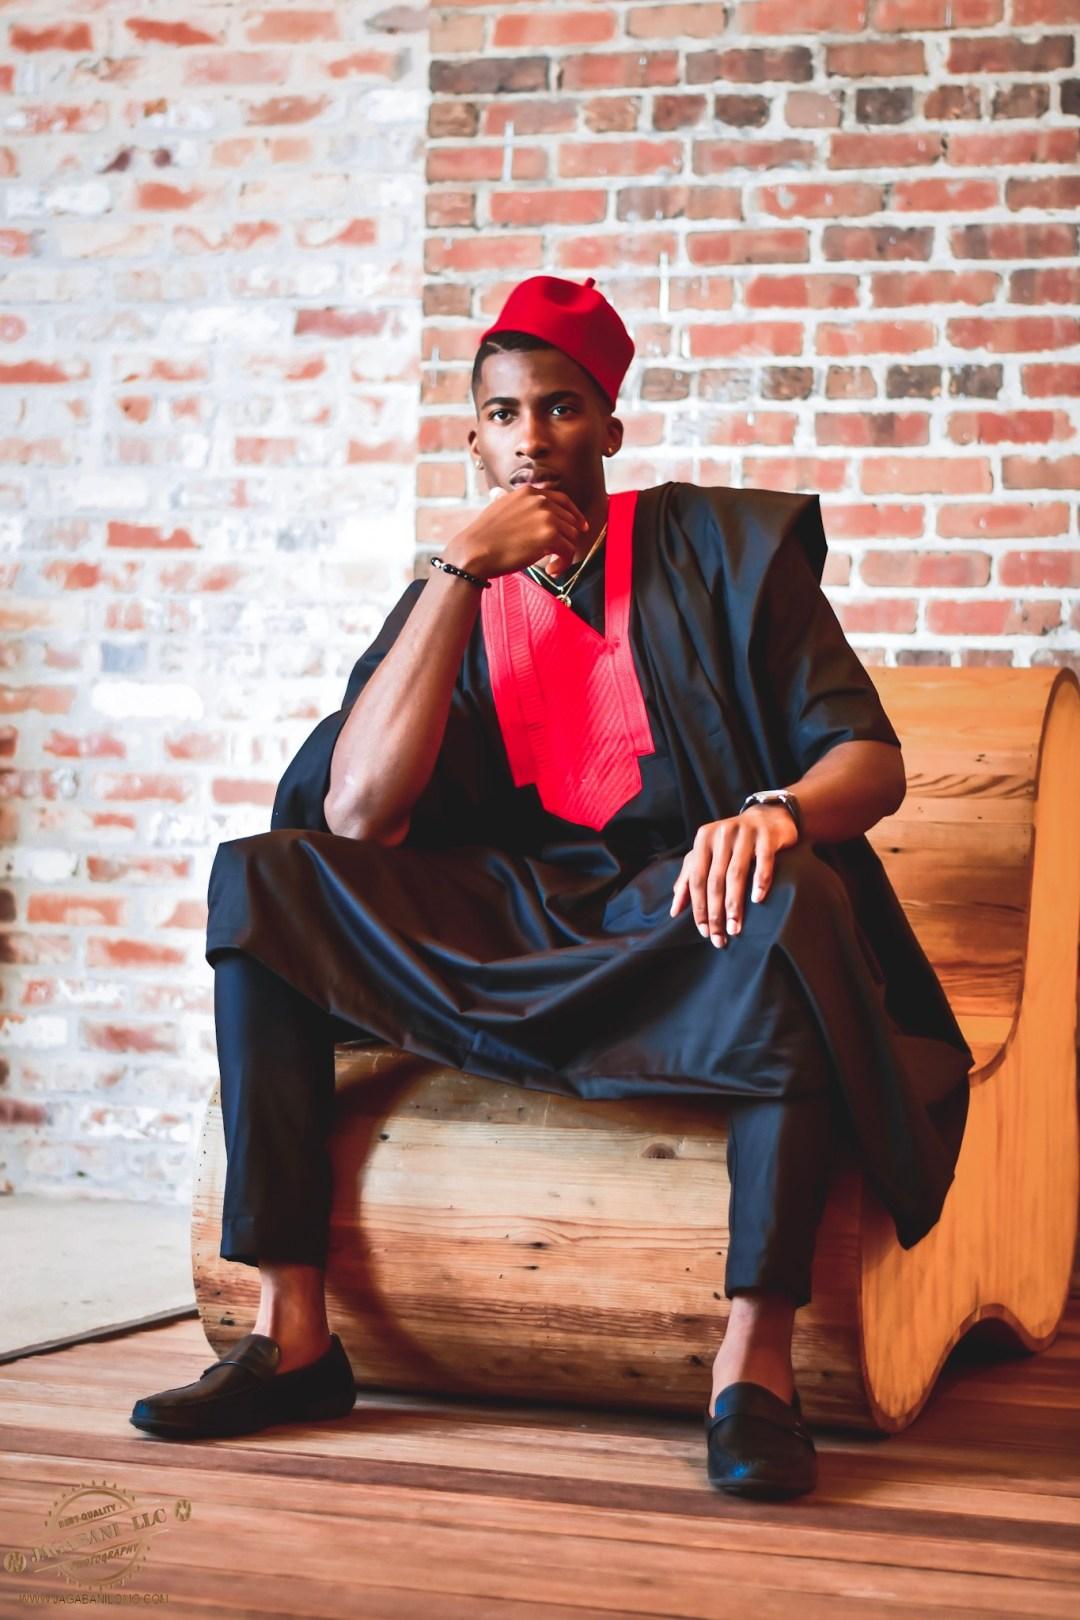 Daniel Obiefuna Nwandu, Fondu, Portrait Photography, Nigerian Male Model, Artist, Designer, Commissioner of Reflex Football, RFB, Unique Traditional Black Custom Fit, Men's Fashion